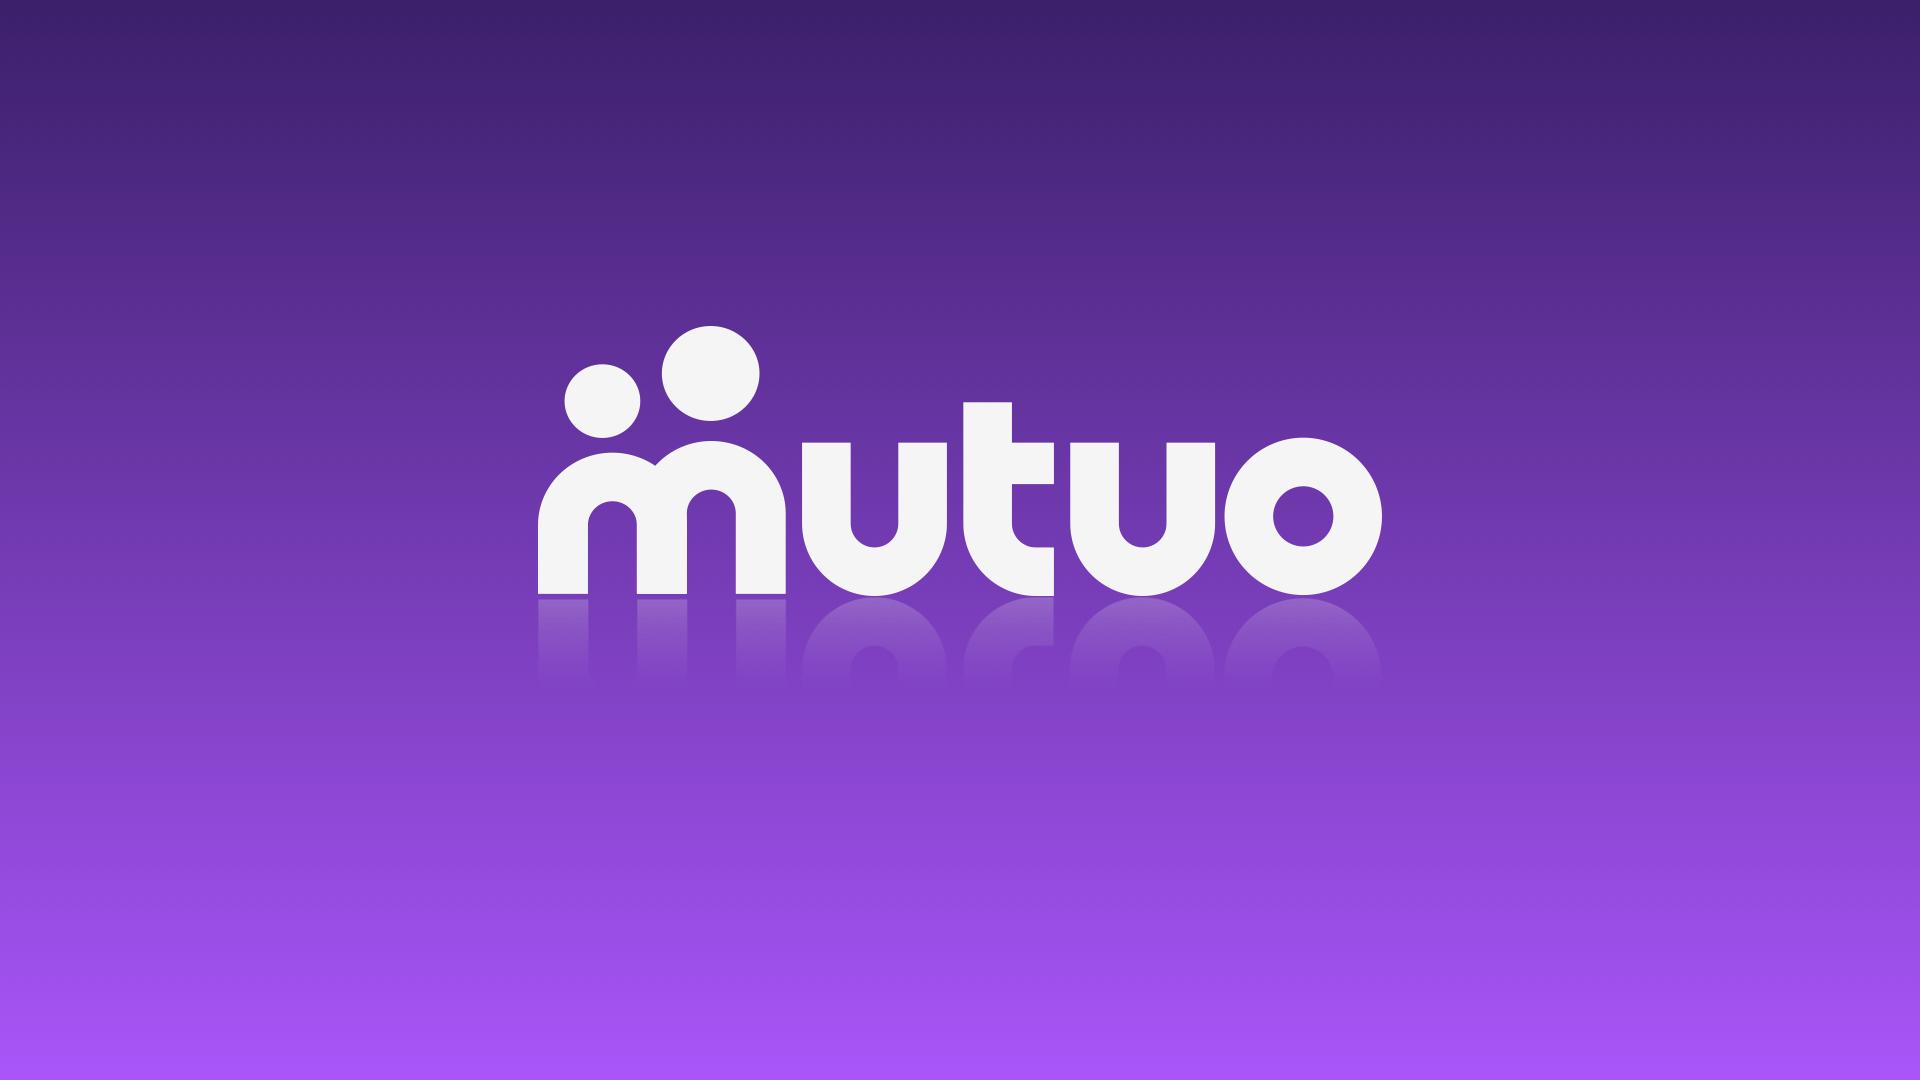 Branding for Mutuality think tank  MUTUO